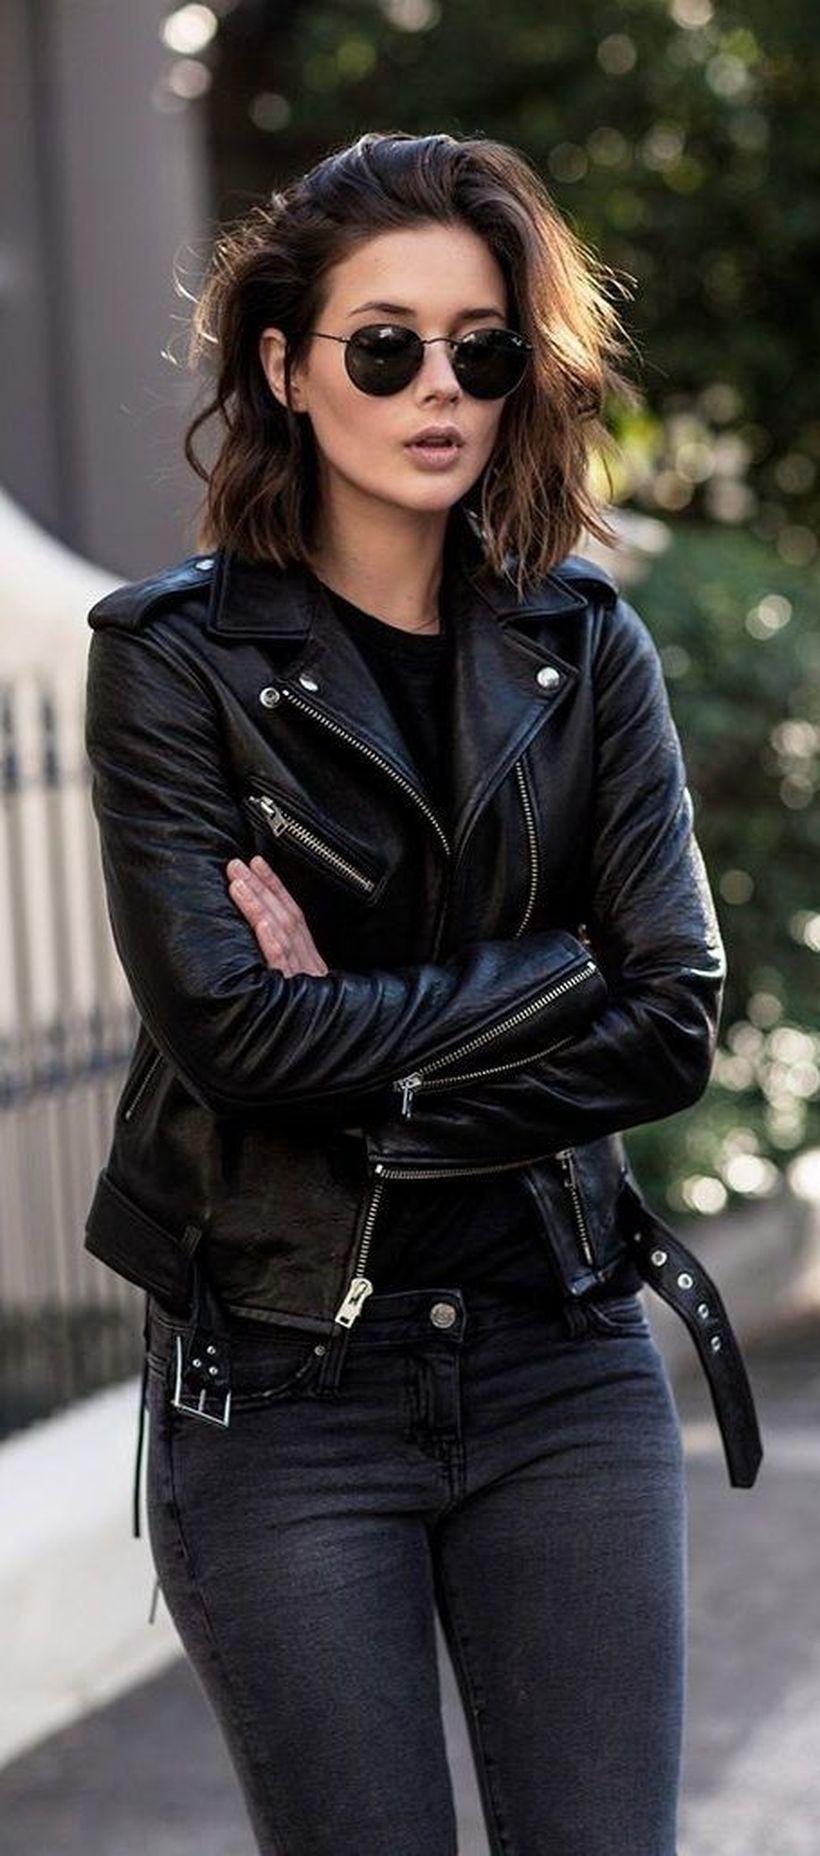 Black-leather-jacket-and-denim-pants